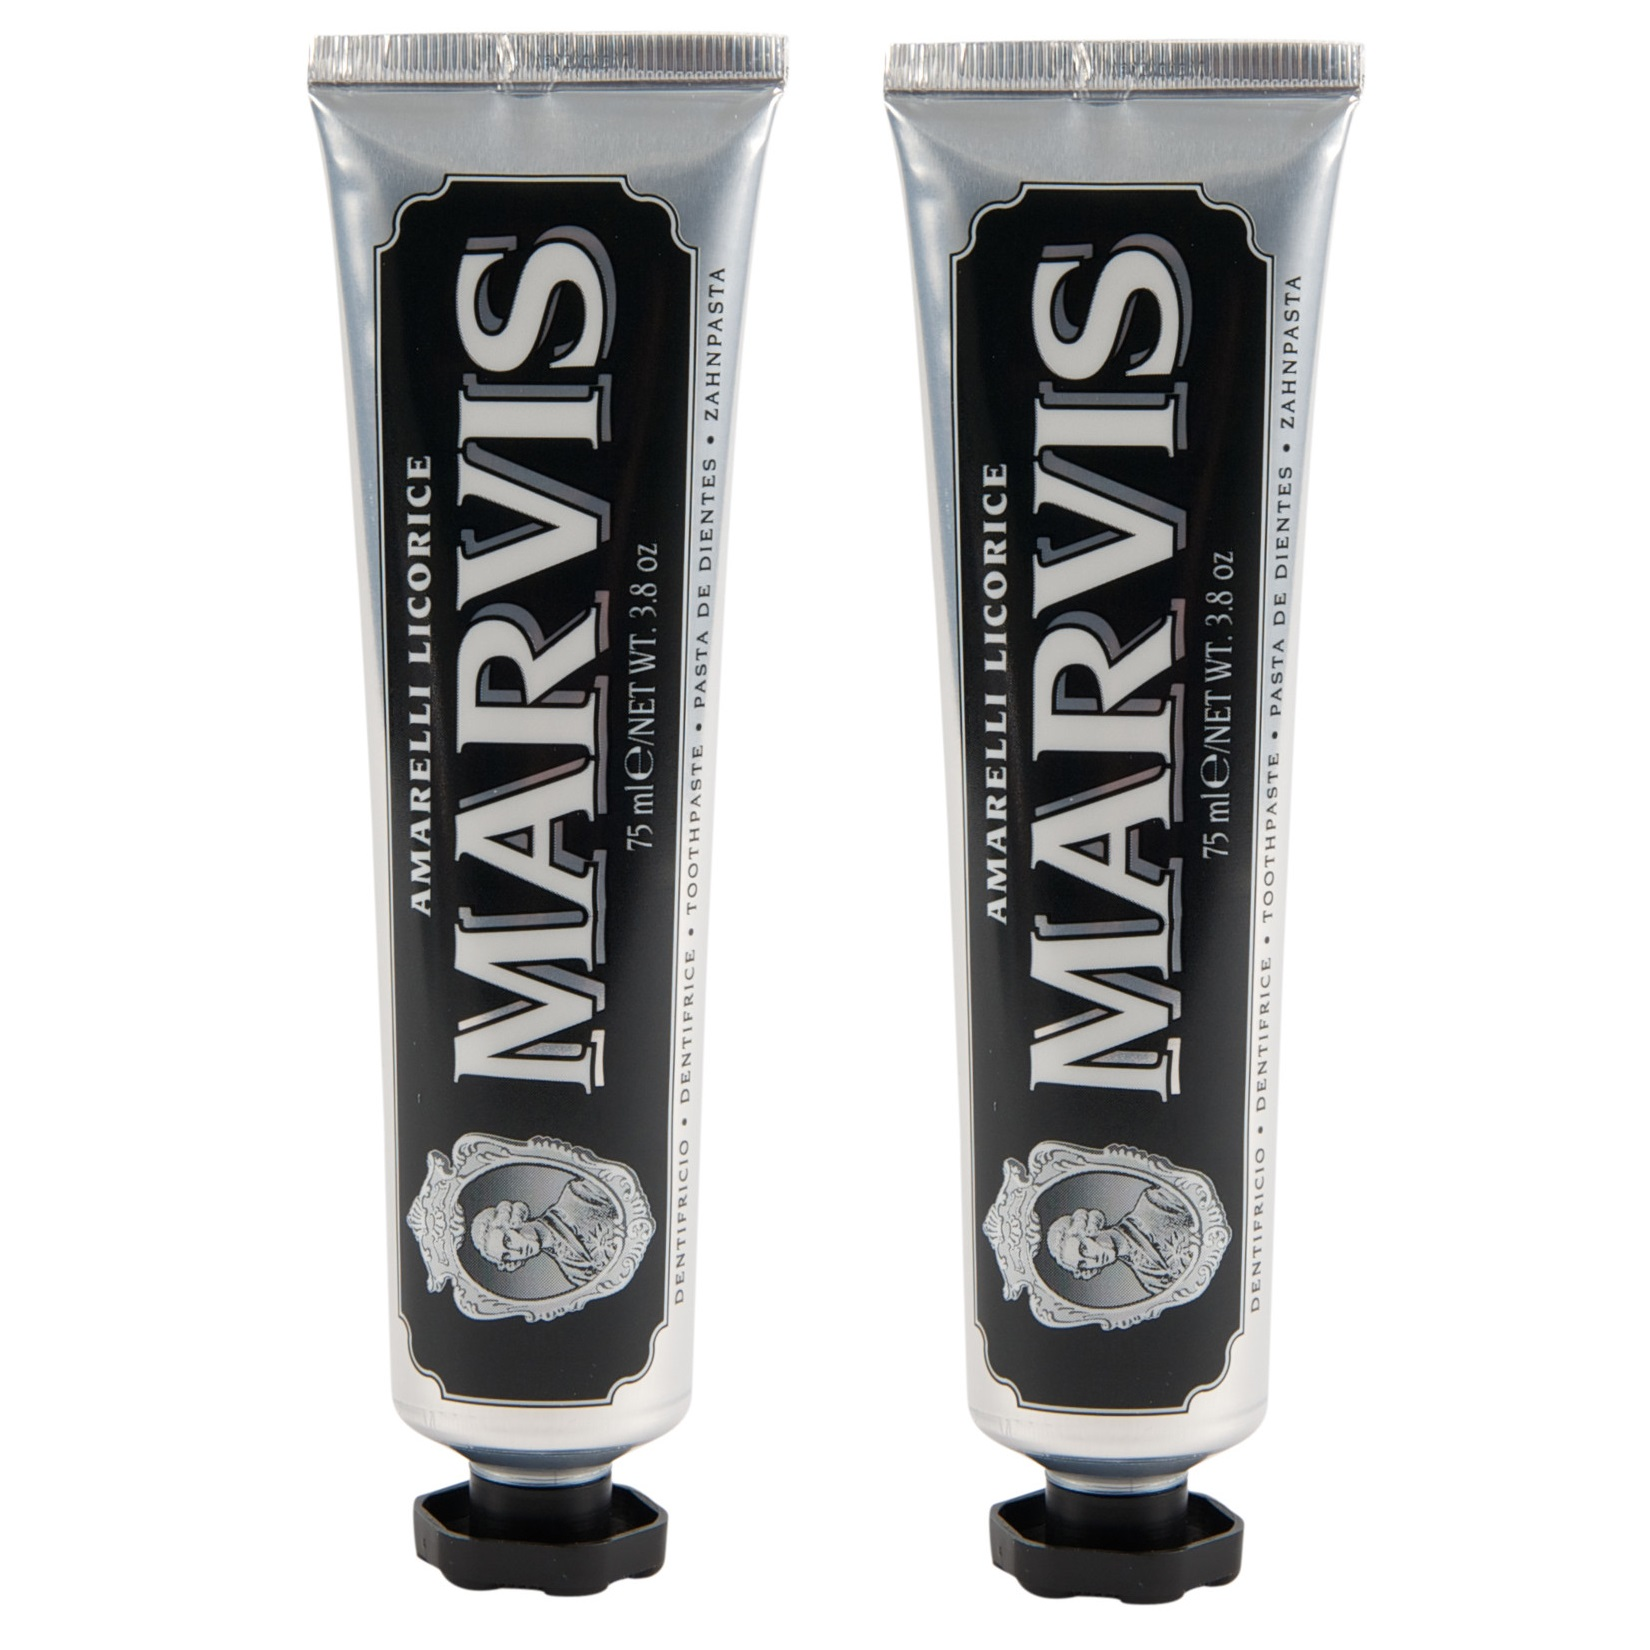 MARVIS - Toothpaste Licorice Mint 2x85 ml